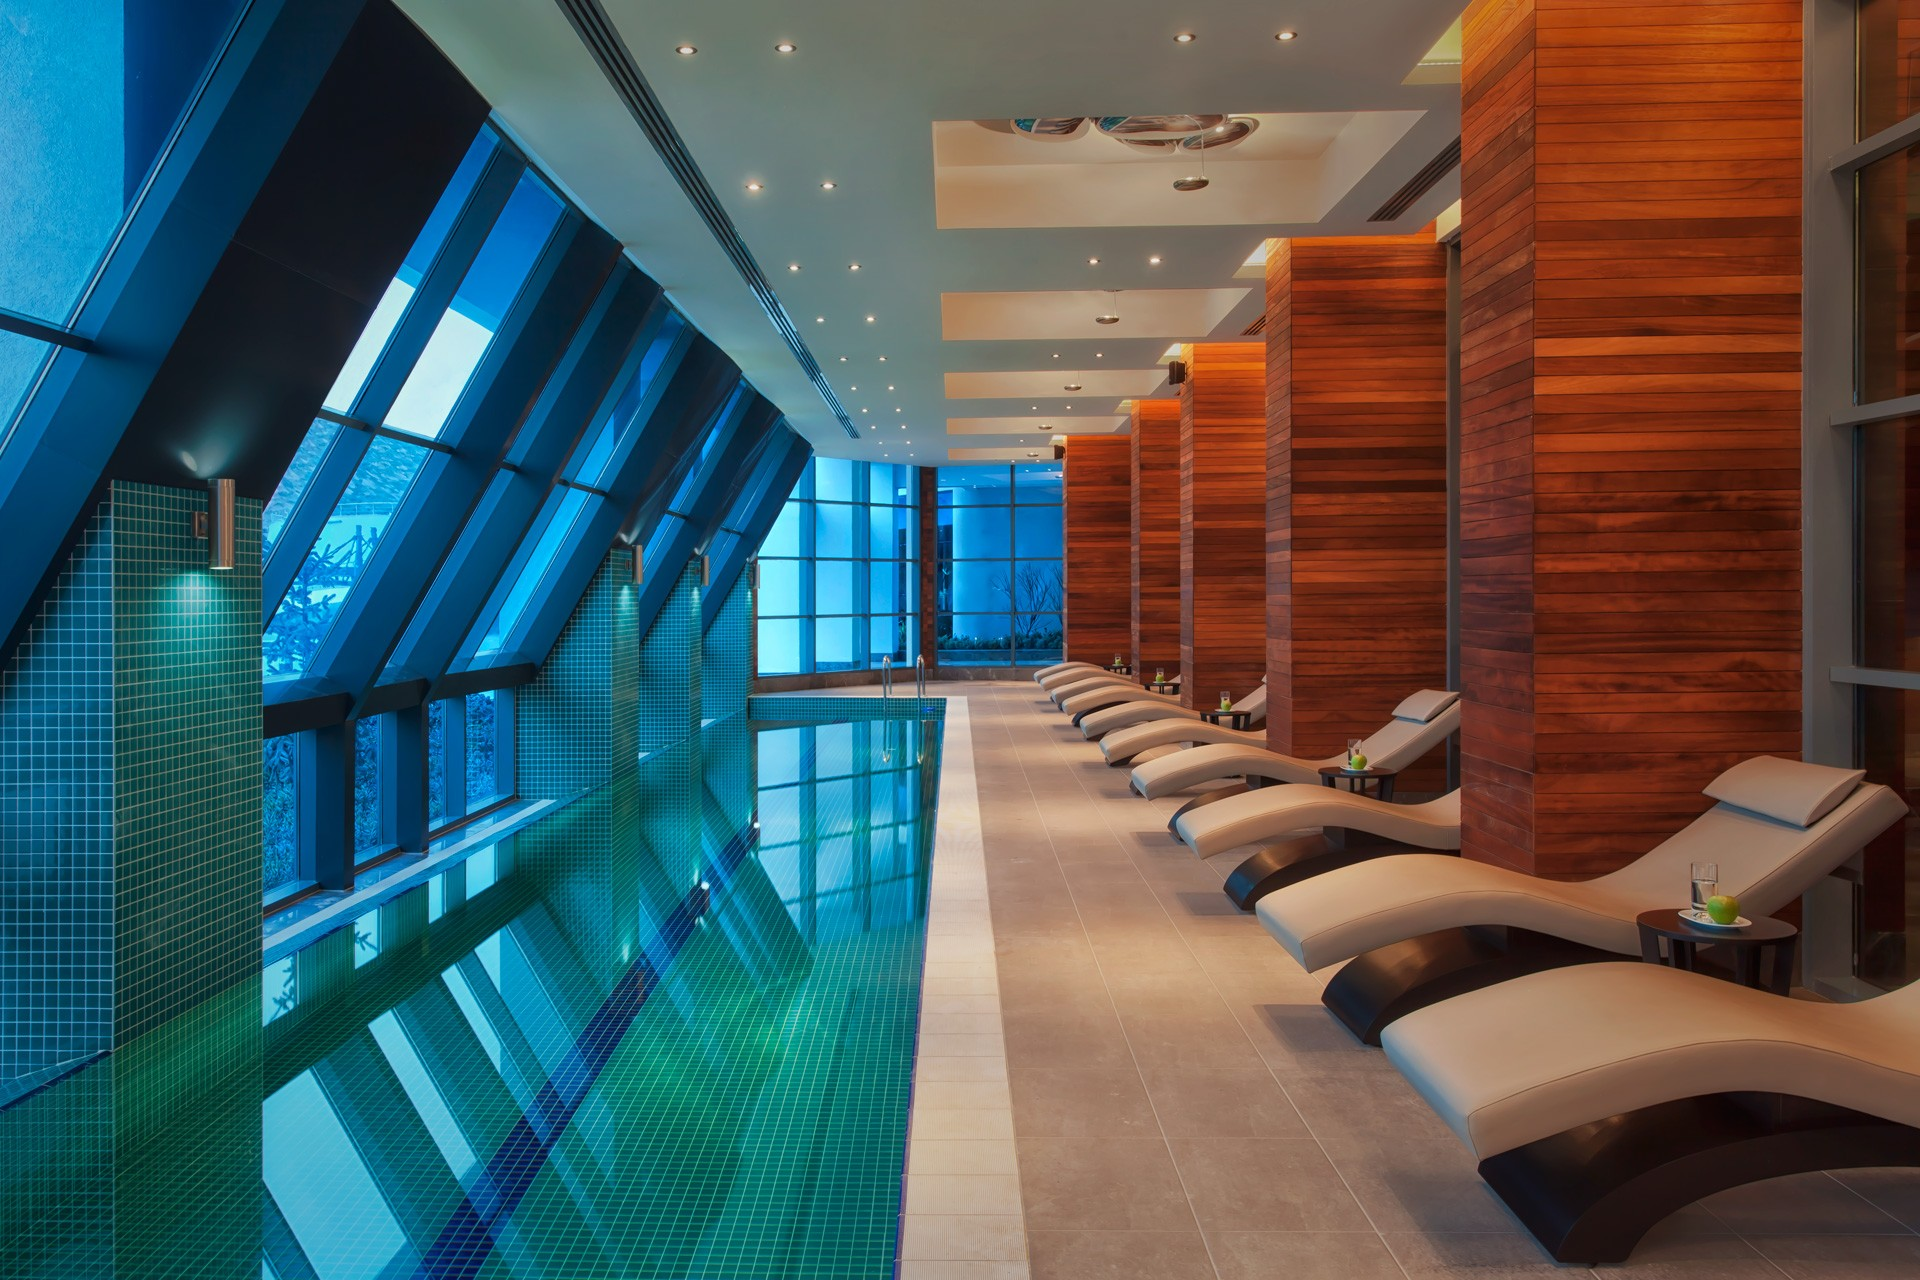 Radisson Blu Hotel Tuzla | Performance Pool